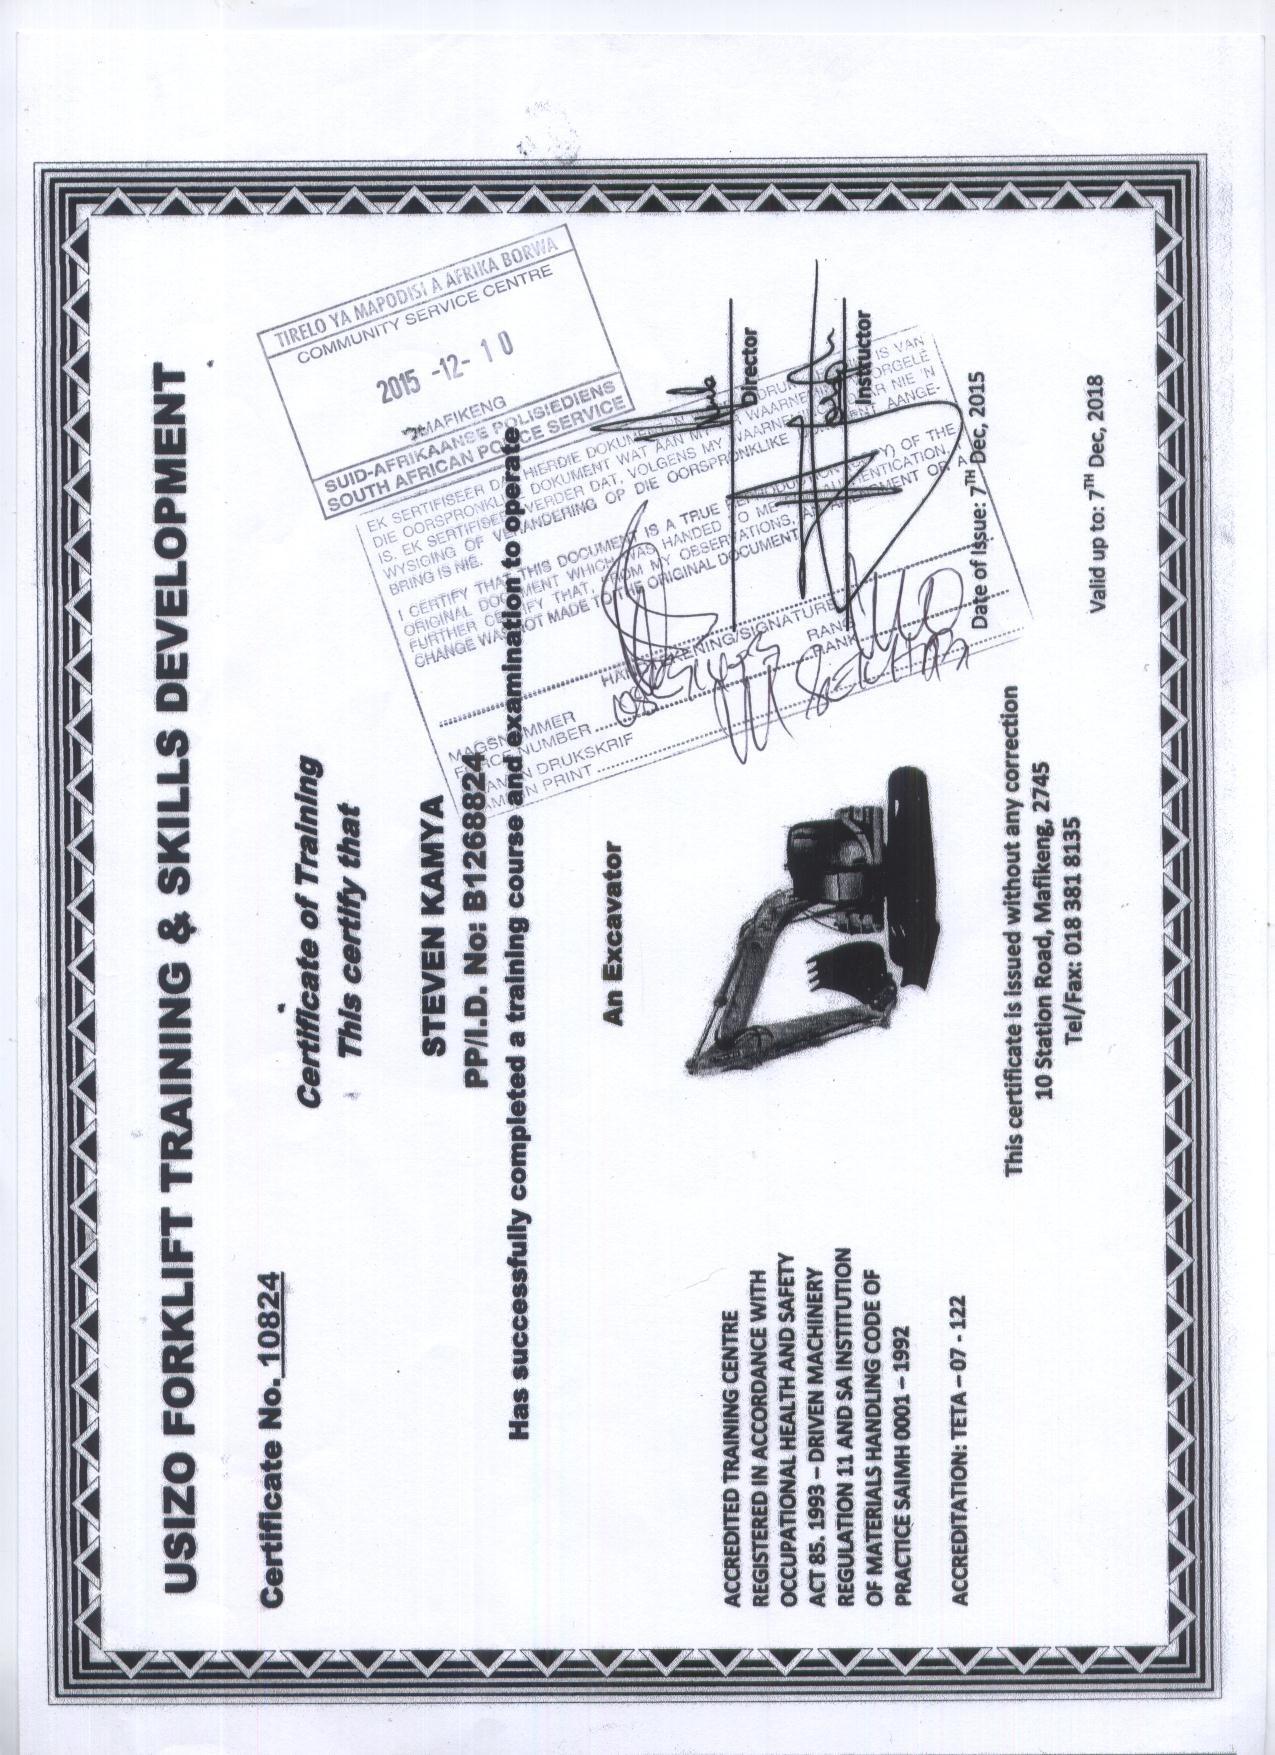 Kamya steven bayt usuzo forklift training skills develment rsa certificate 1betcityfo Gallery